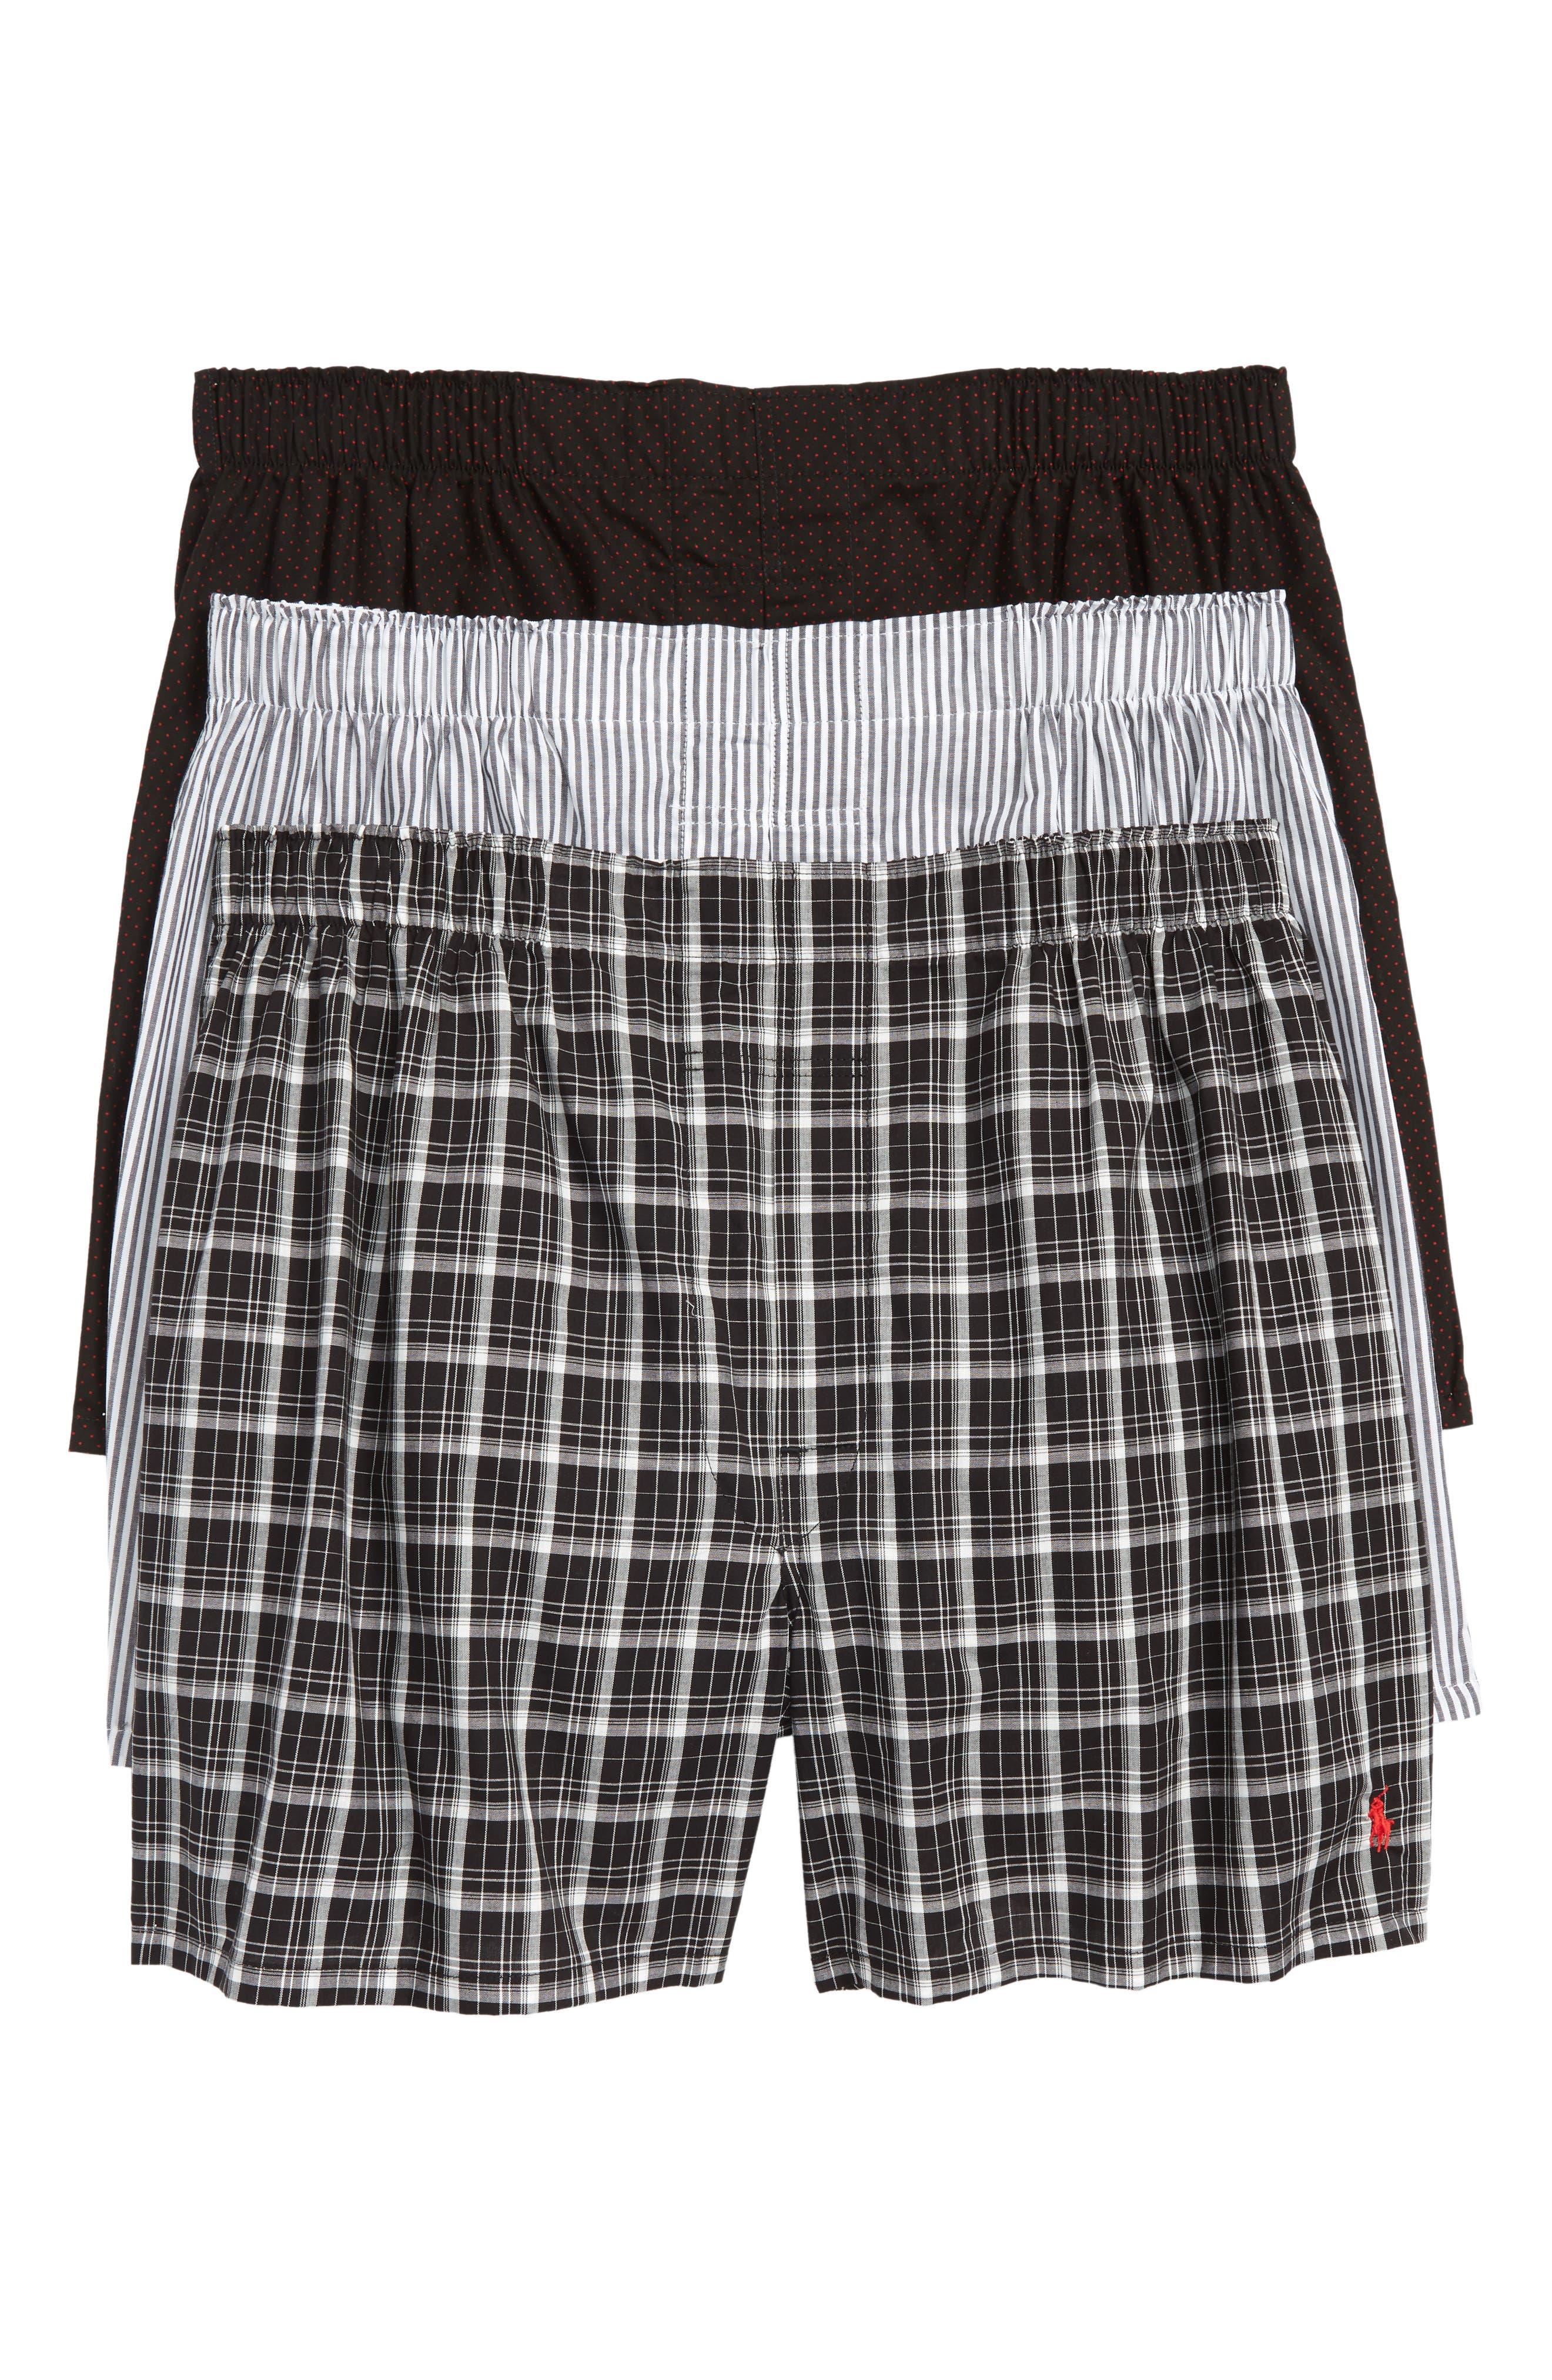 3-Pack Woven Cotton Boxers,                         Main,                         color, POLO BLACK/ DOVER/ THOMAS